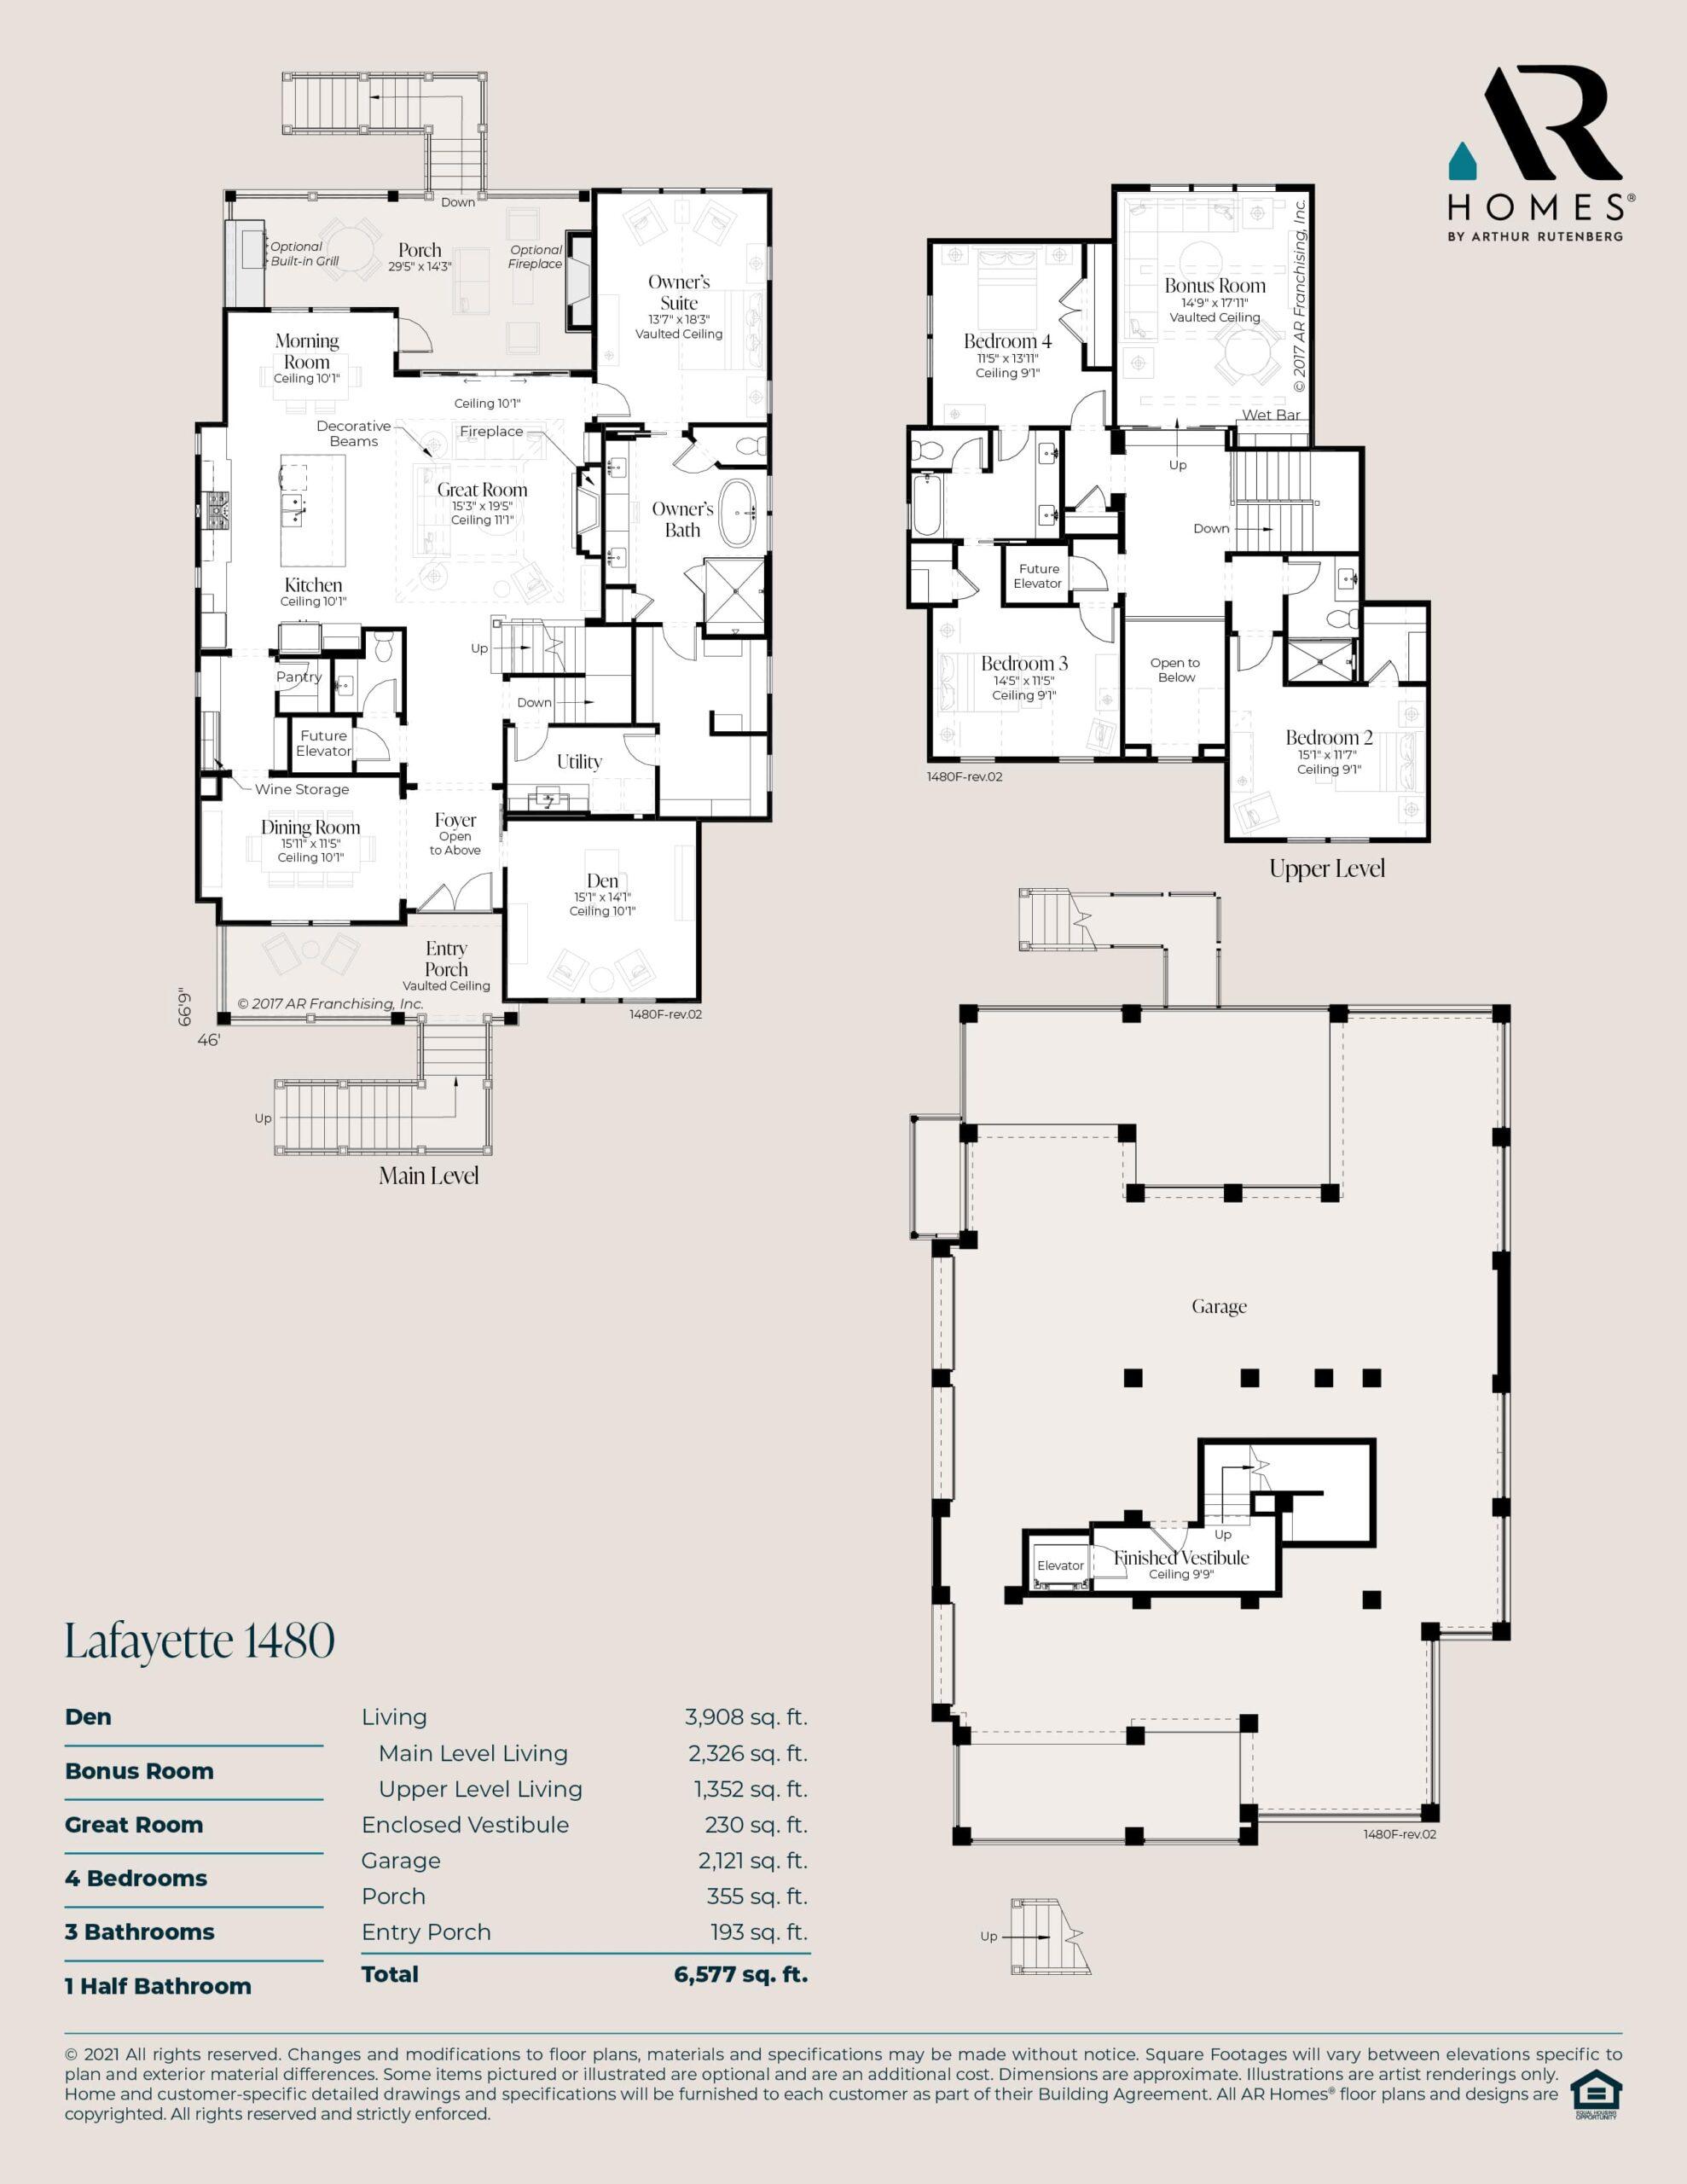 Lafayette 1480 Floor Plan